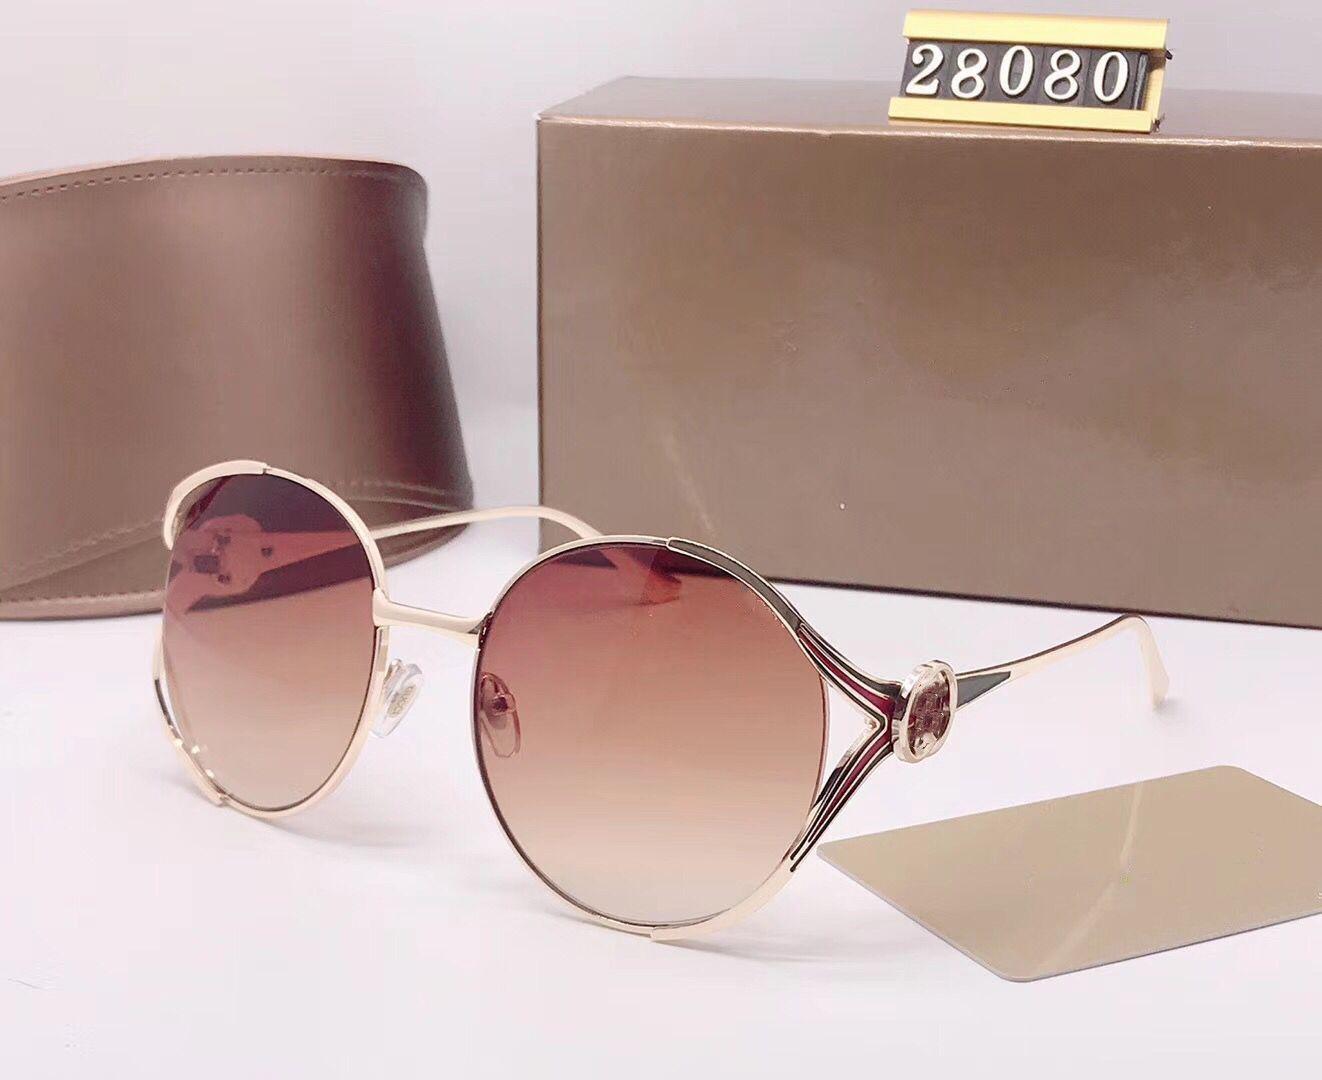 DFGDRG Marque Gold Classic Quality Sunglasses Designer Luxe-High Lentilles Femme Verres de verre Lunettes Mens Vert Pilot Sun Metal Brown BDOG